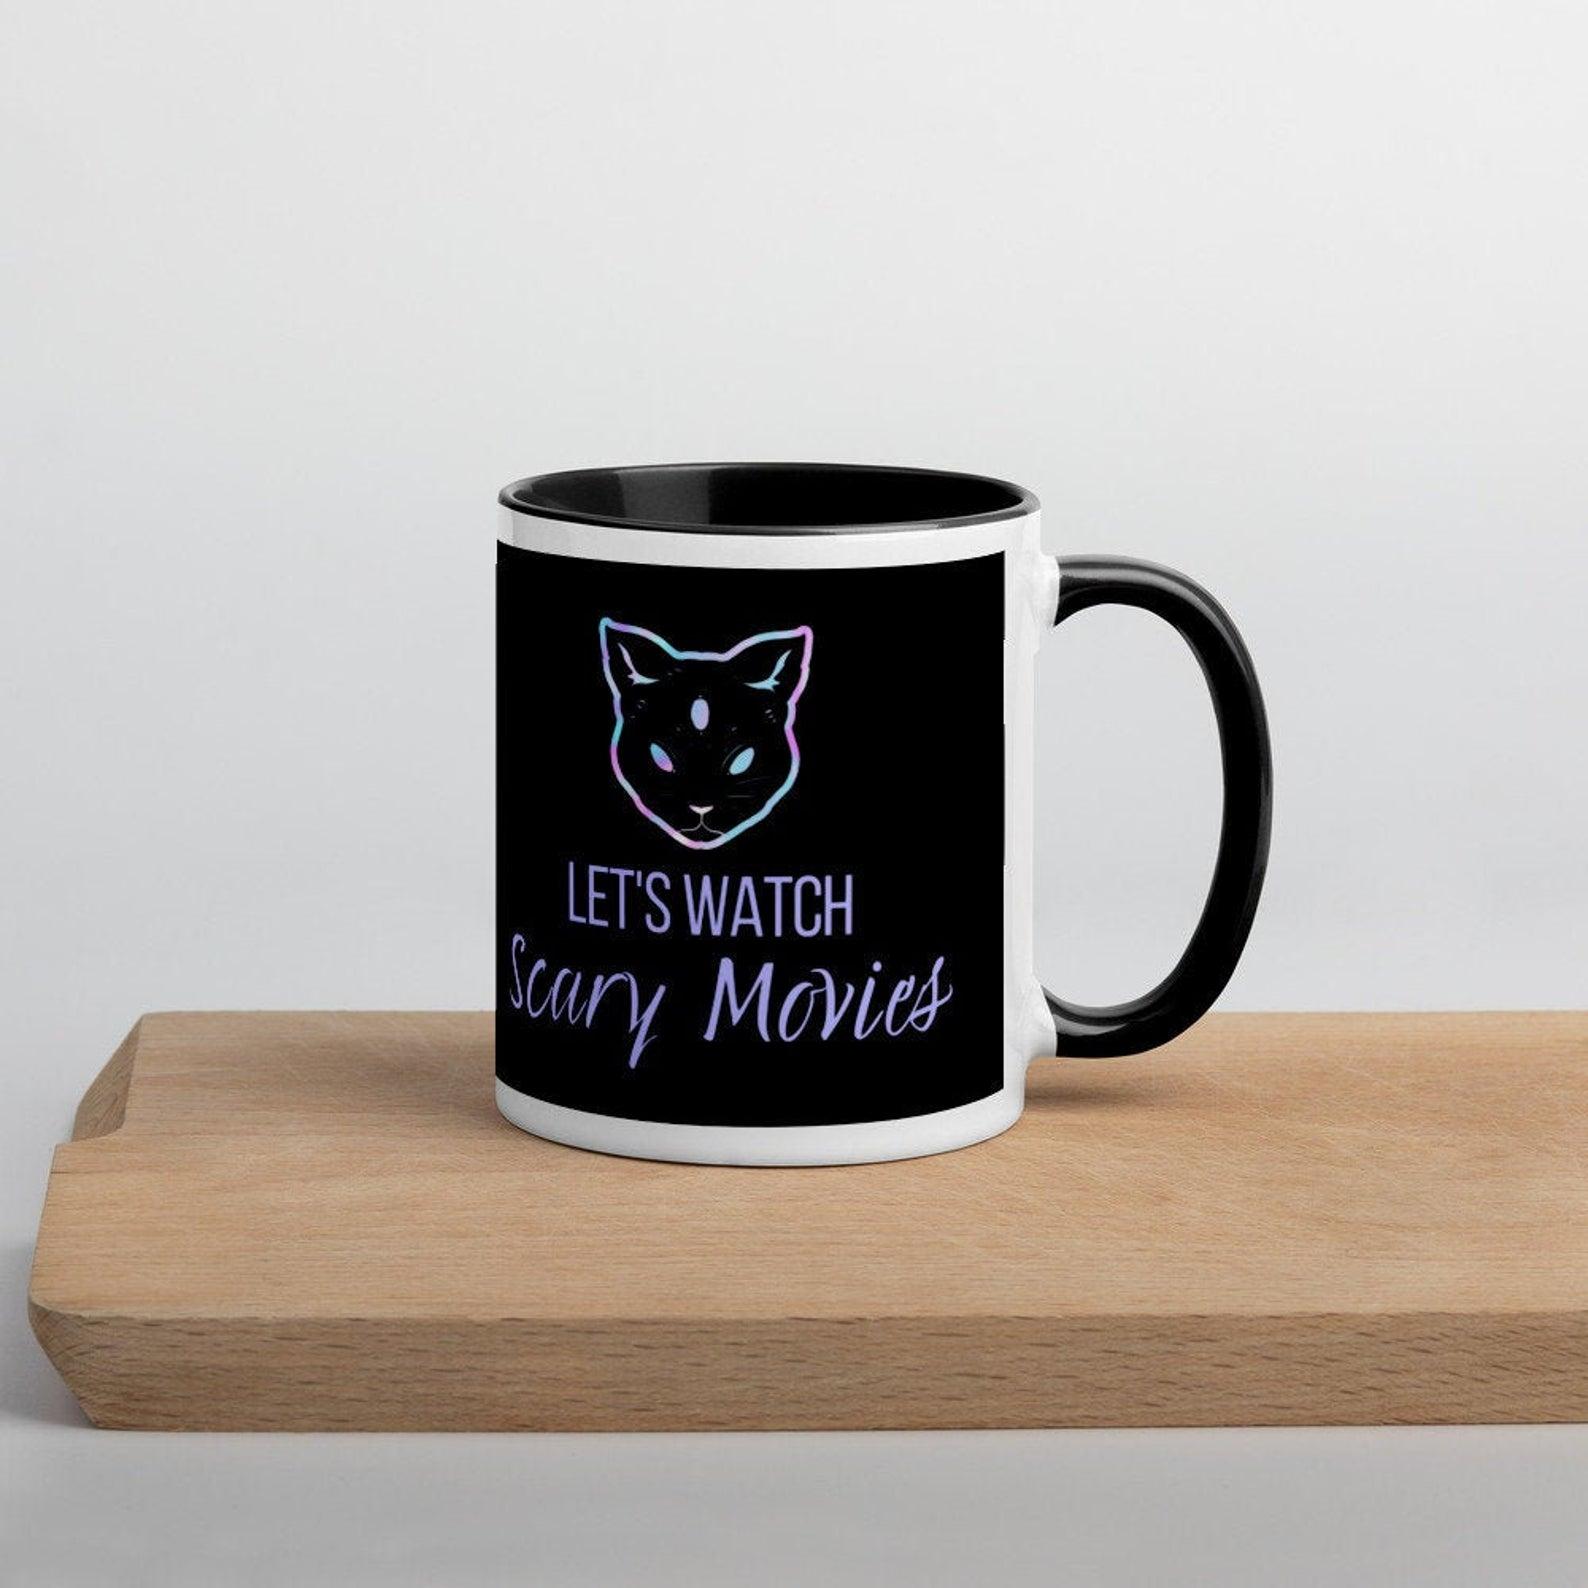 Let's Watch Scary Movies Mug - Horror Movie Mug - Horror Mug